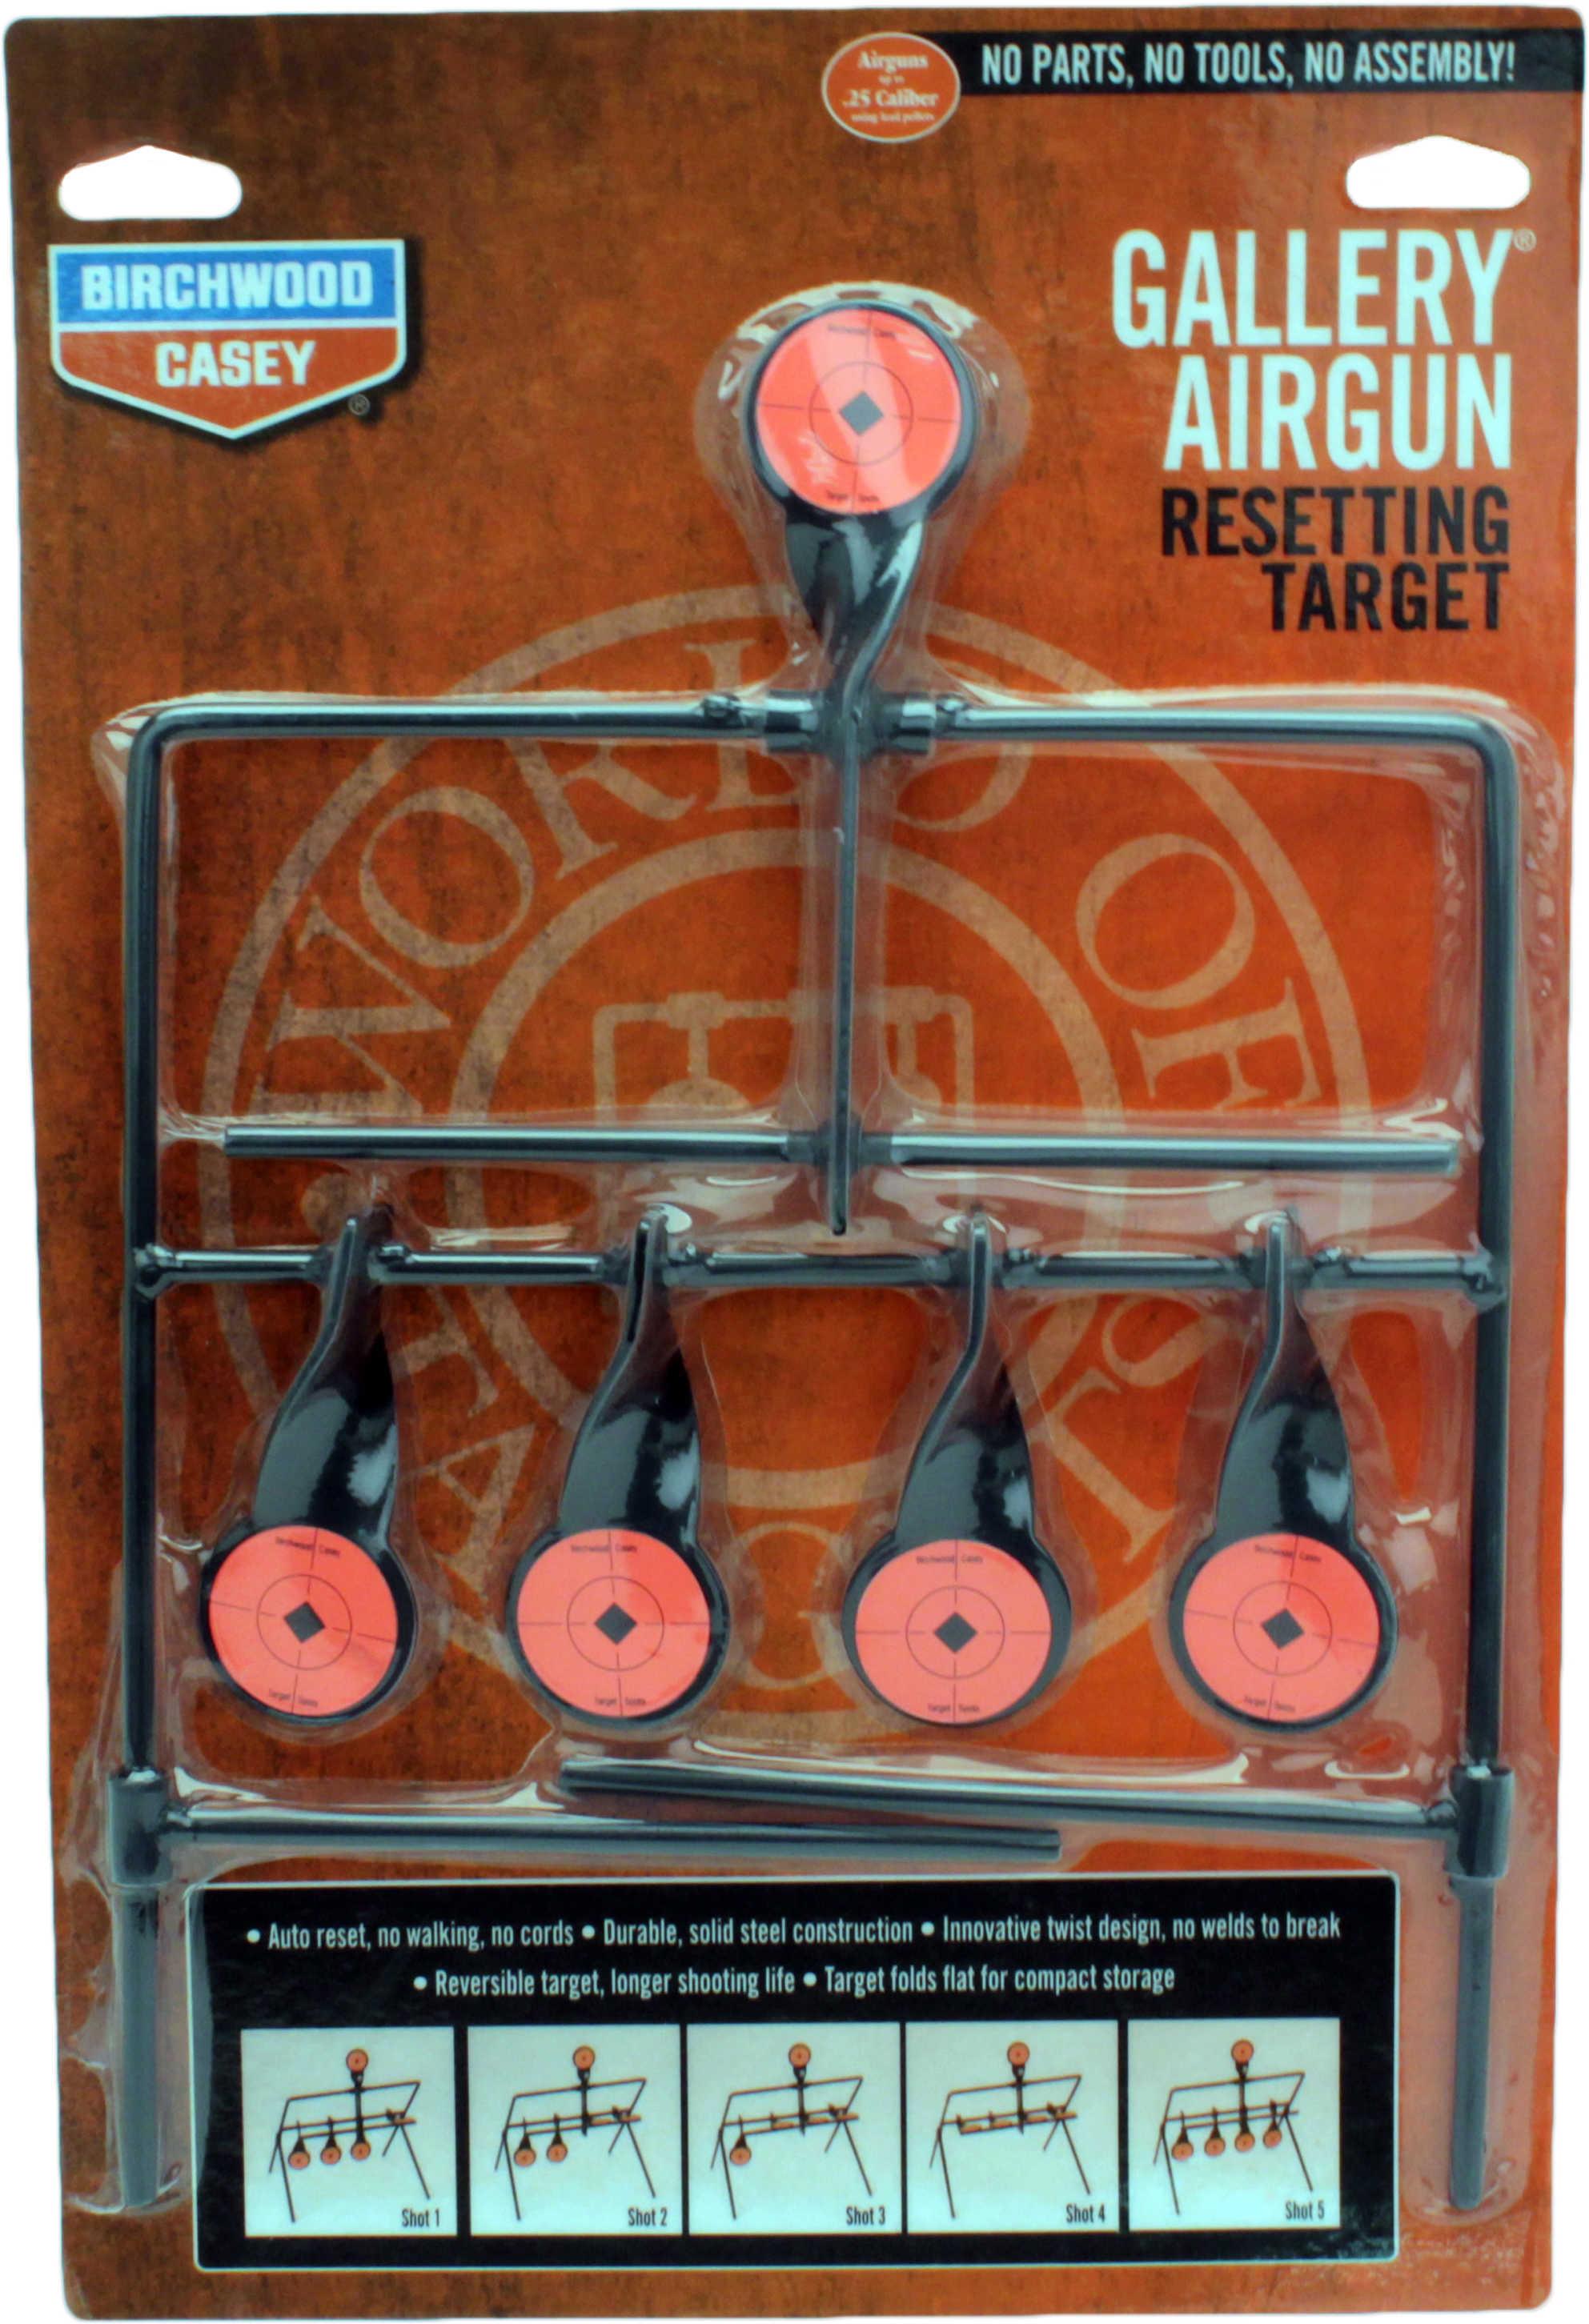 Birchwood Casey Gallery Resetting Target Gallery Air Gun Resetting Target Md: 47017